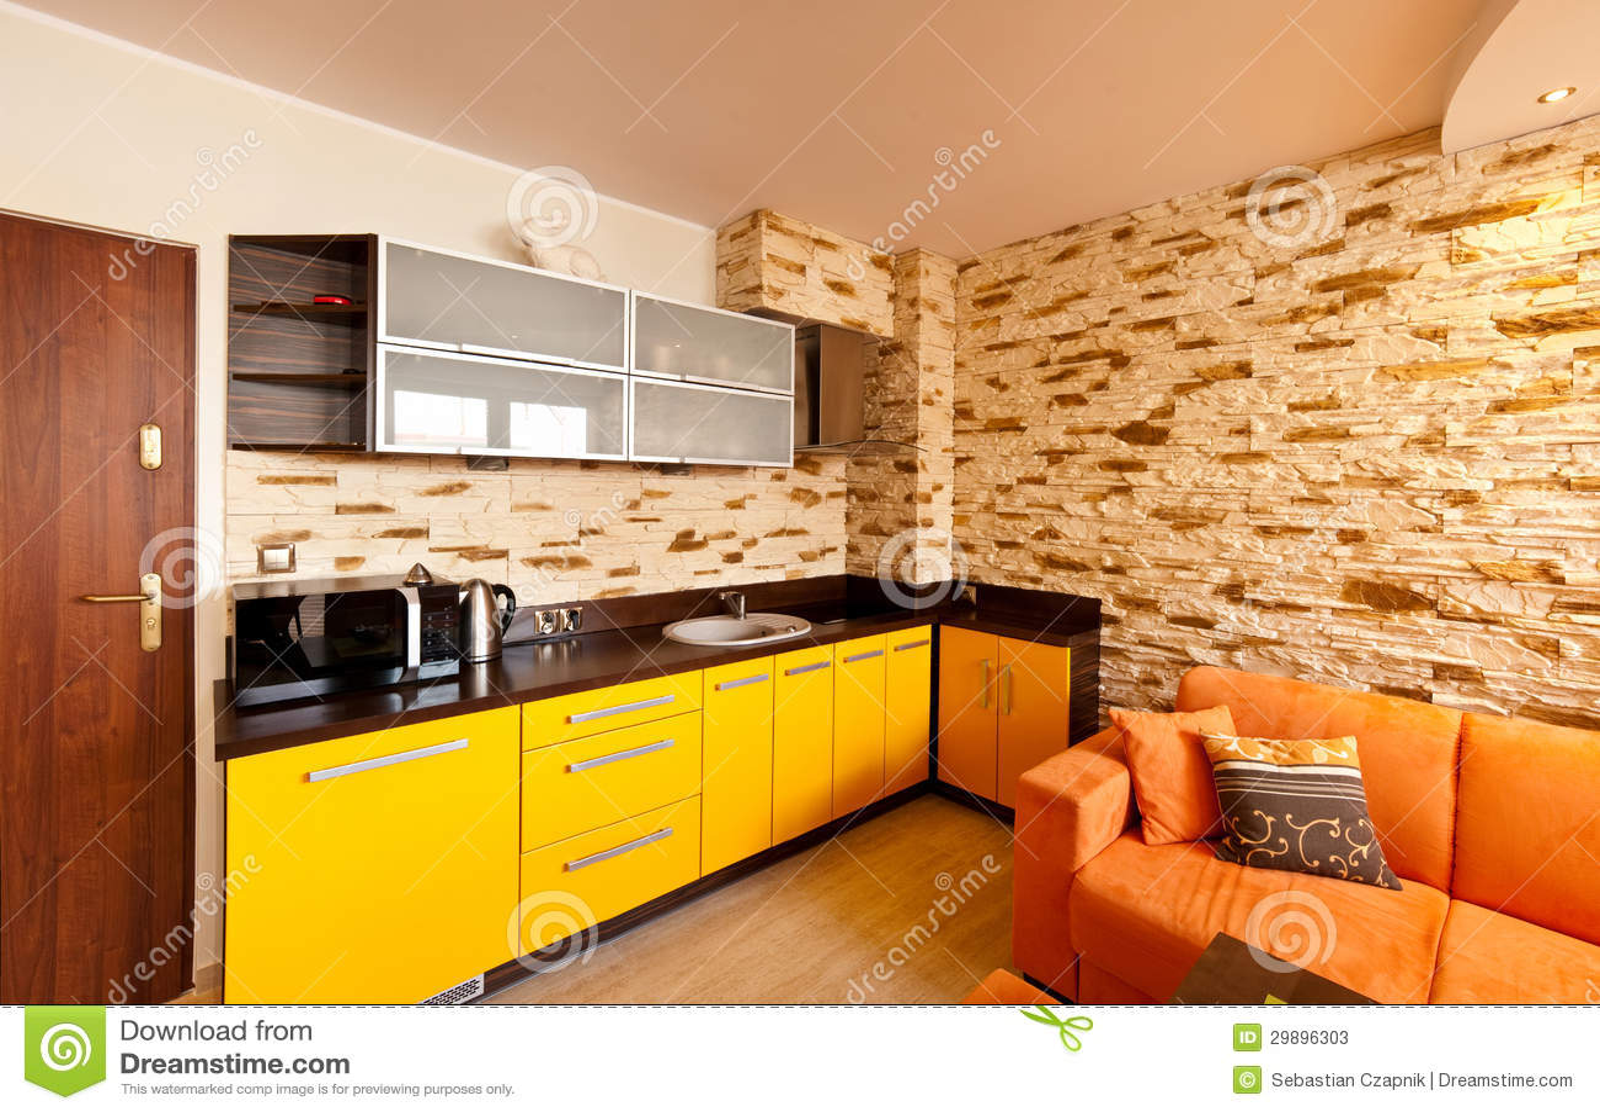 Pomarańczowa izbowa kuchnia